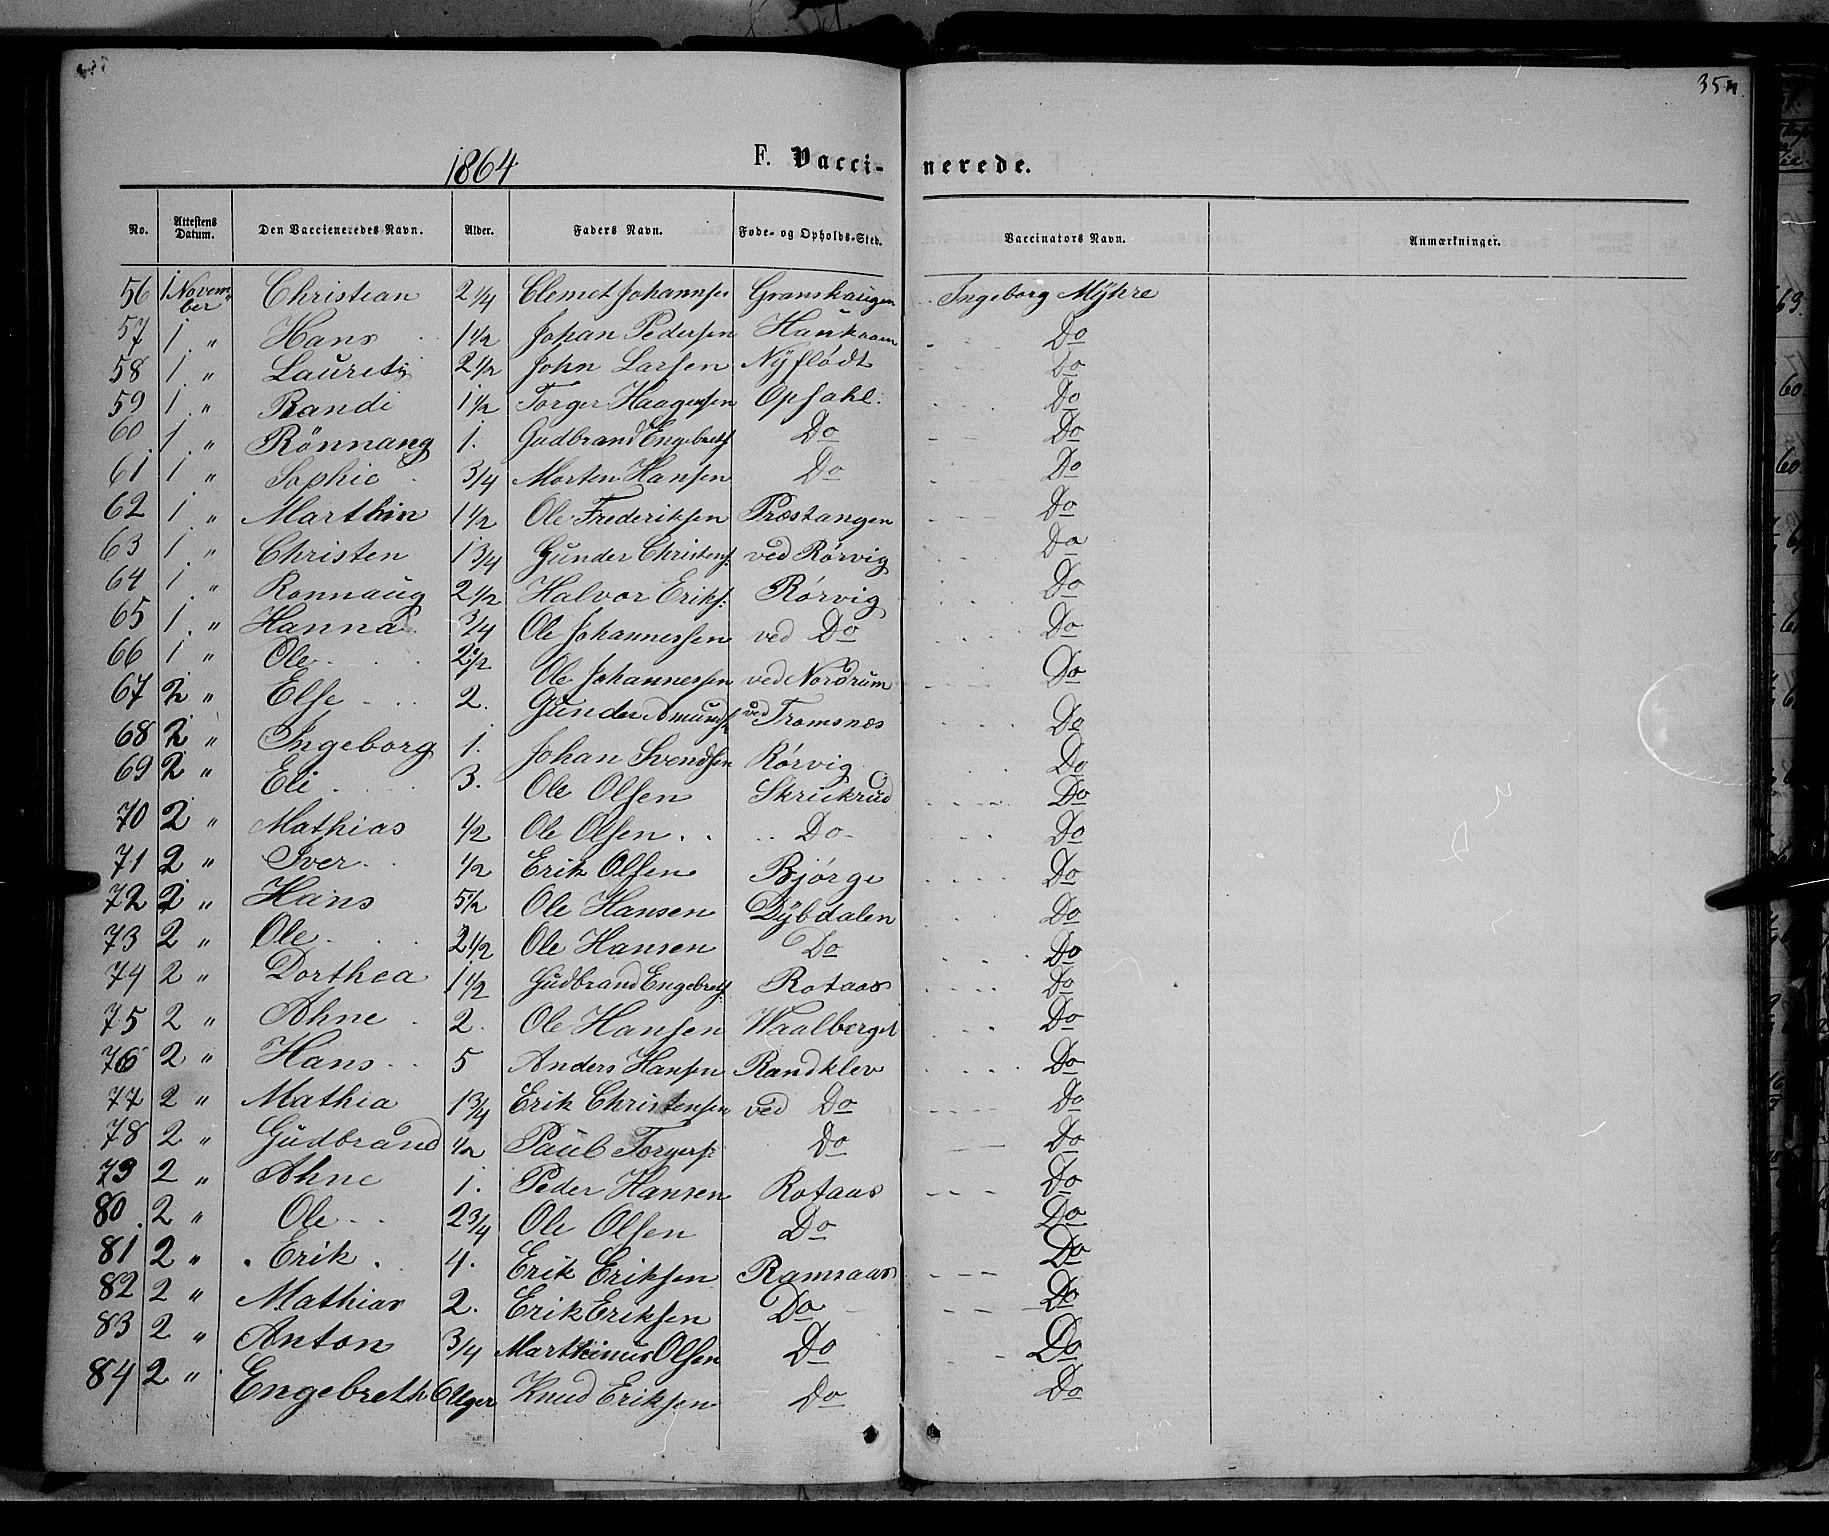 SAH, Ringebu prestekontor, Ministerialbok nr. 7, 1860-1877, s. 354